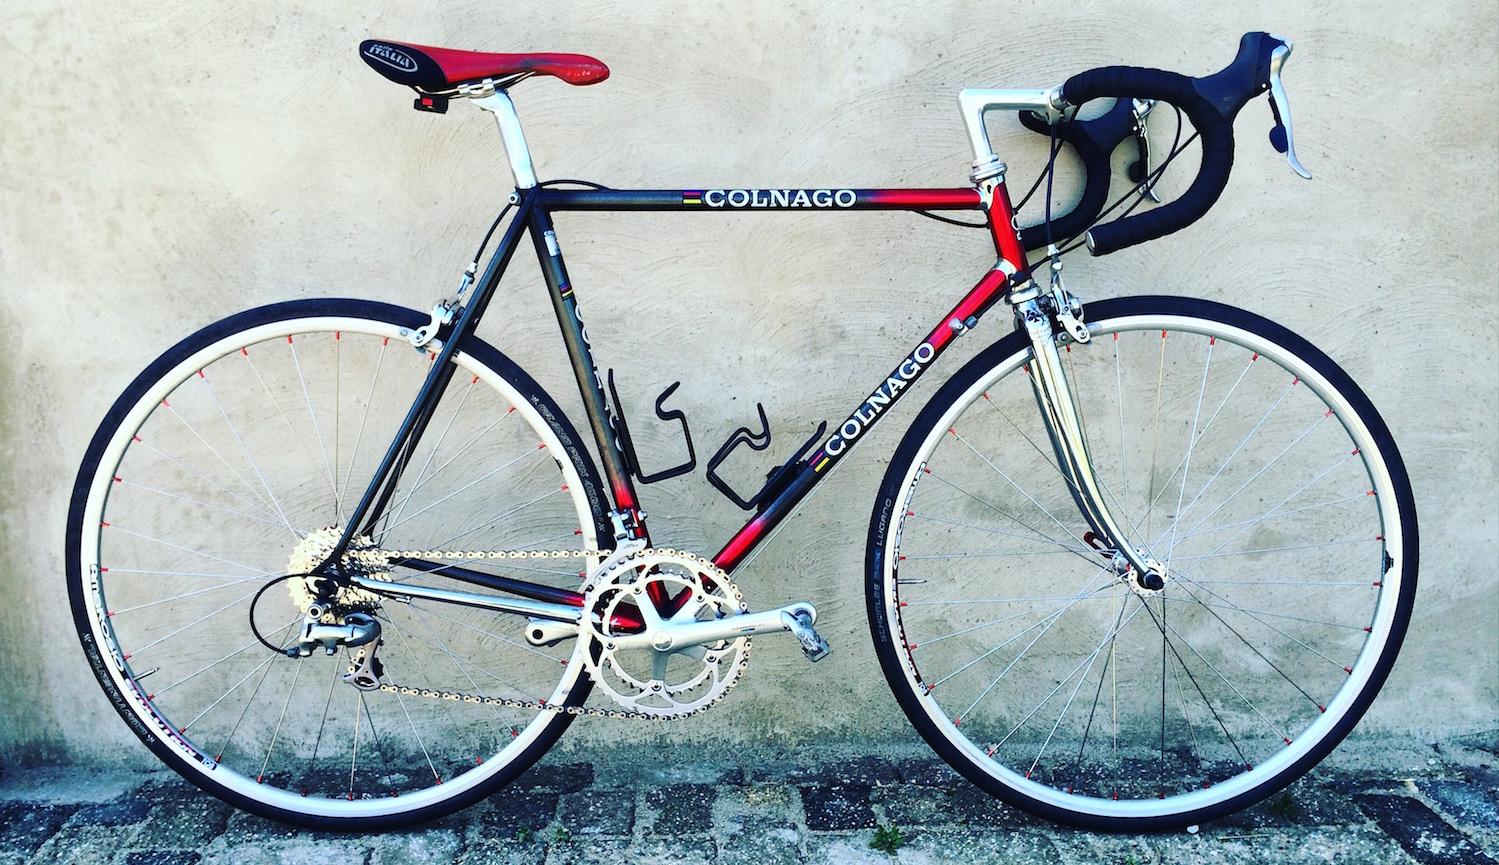 bartandbikes-colnago-xl-1500px